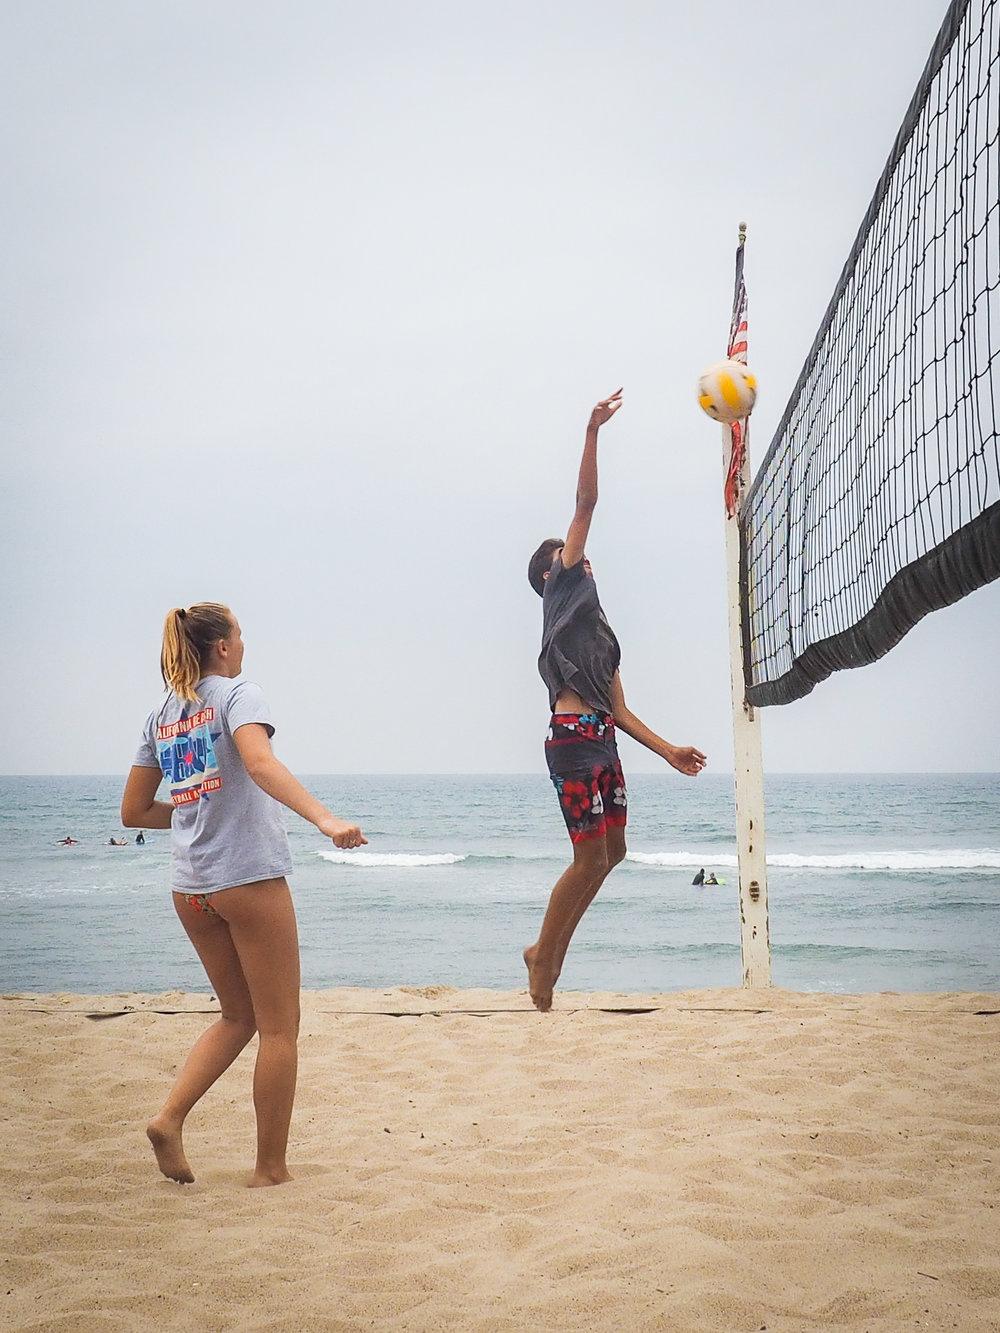 201808 vball beach SanO-30.jpg